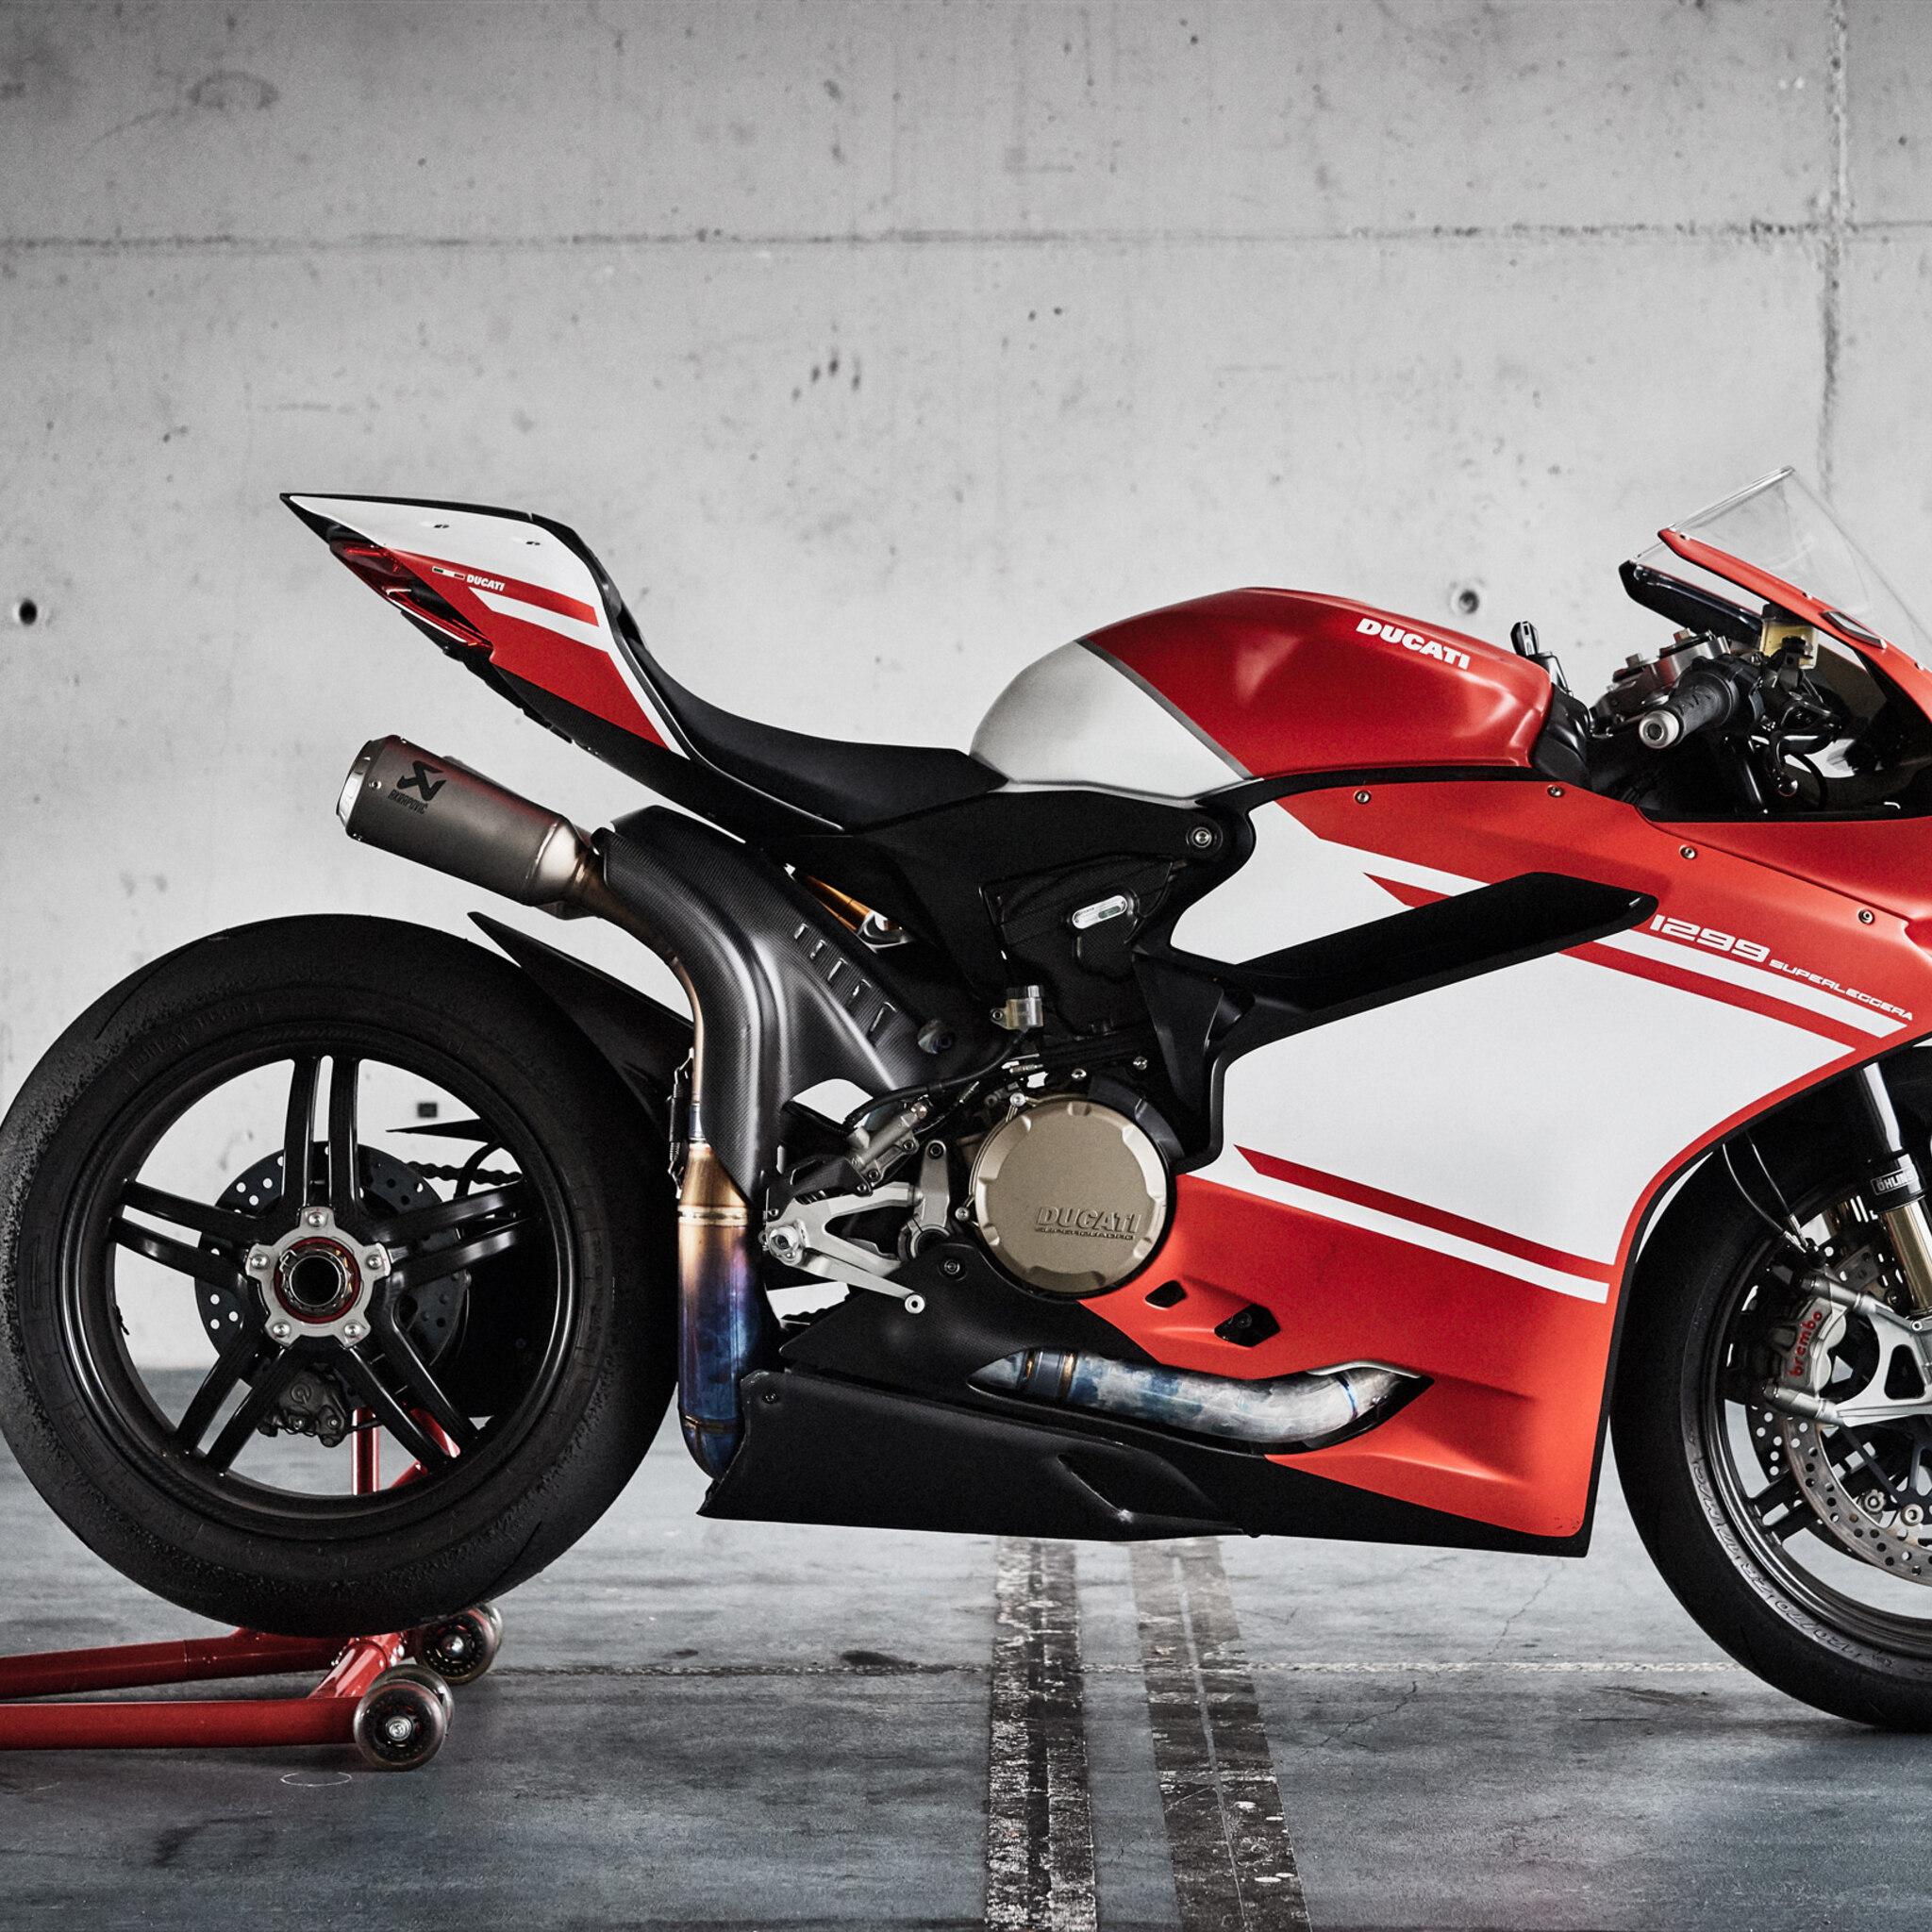 ducati-1299-superleggera-bike-or.jpg